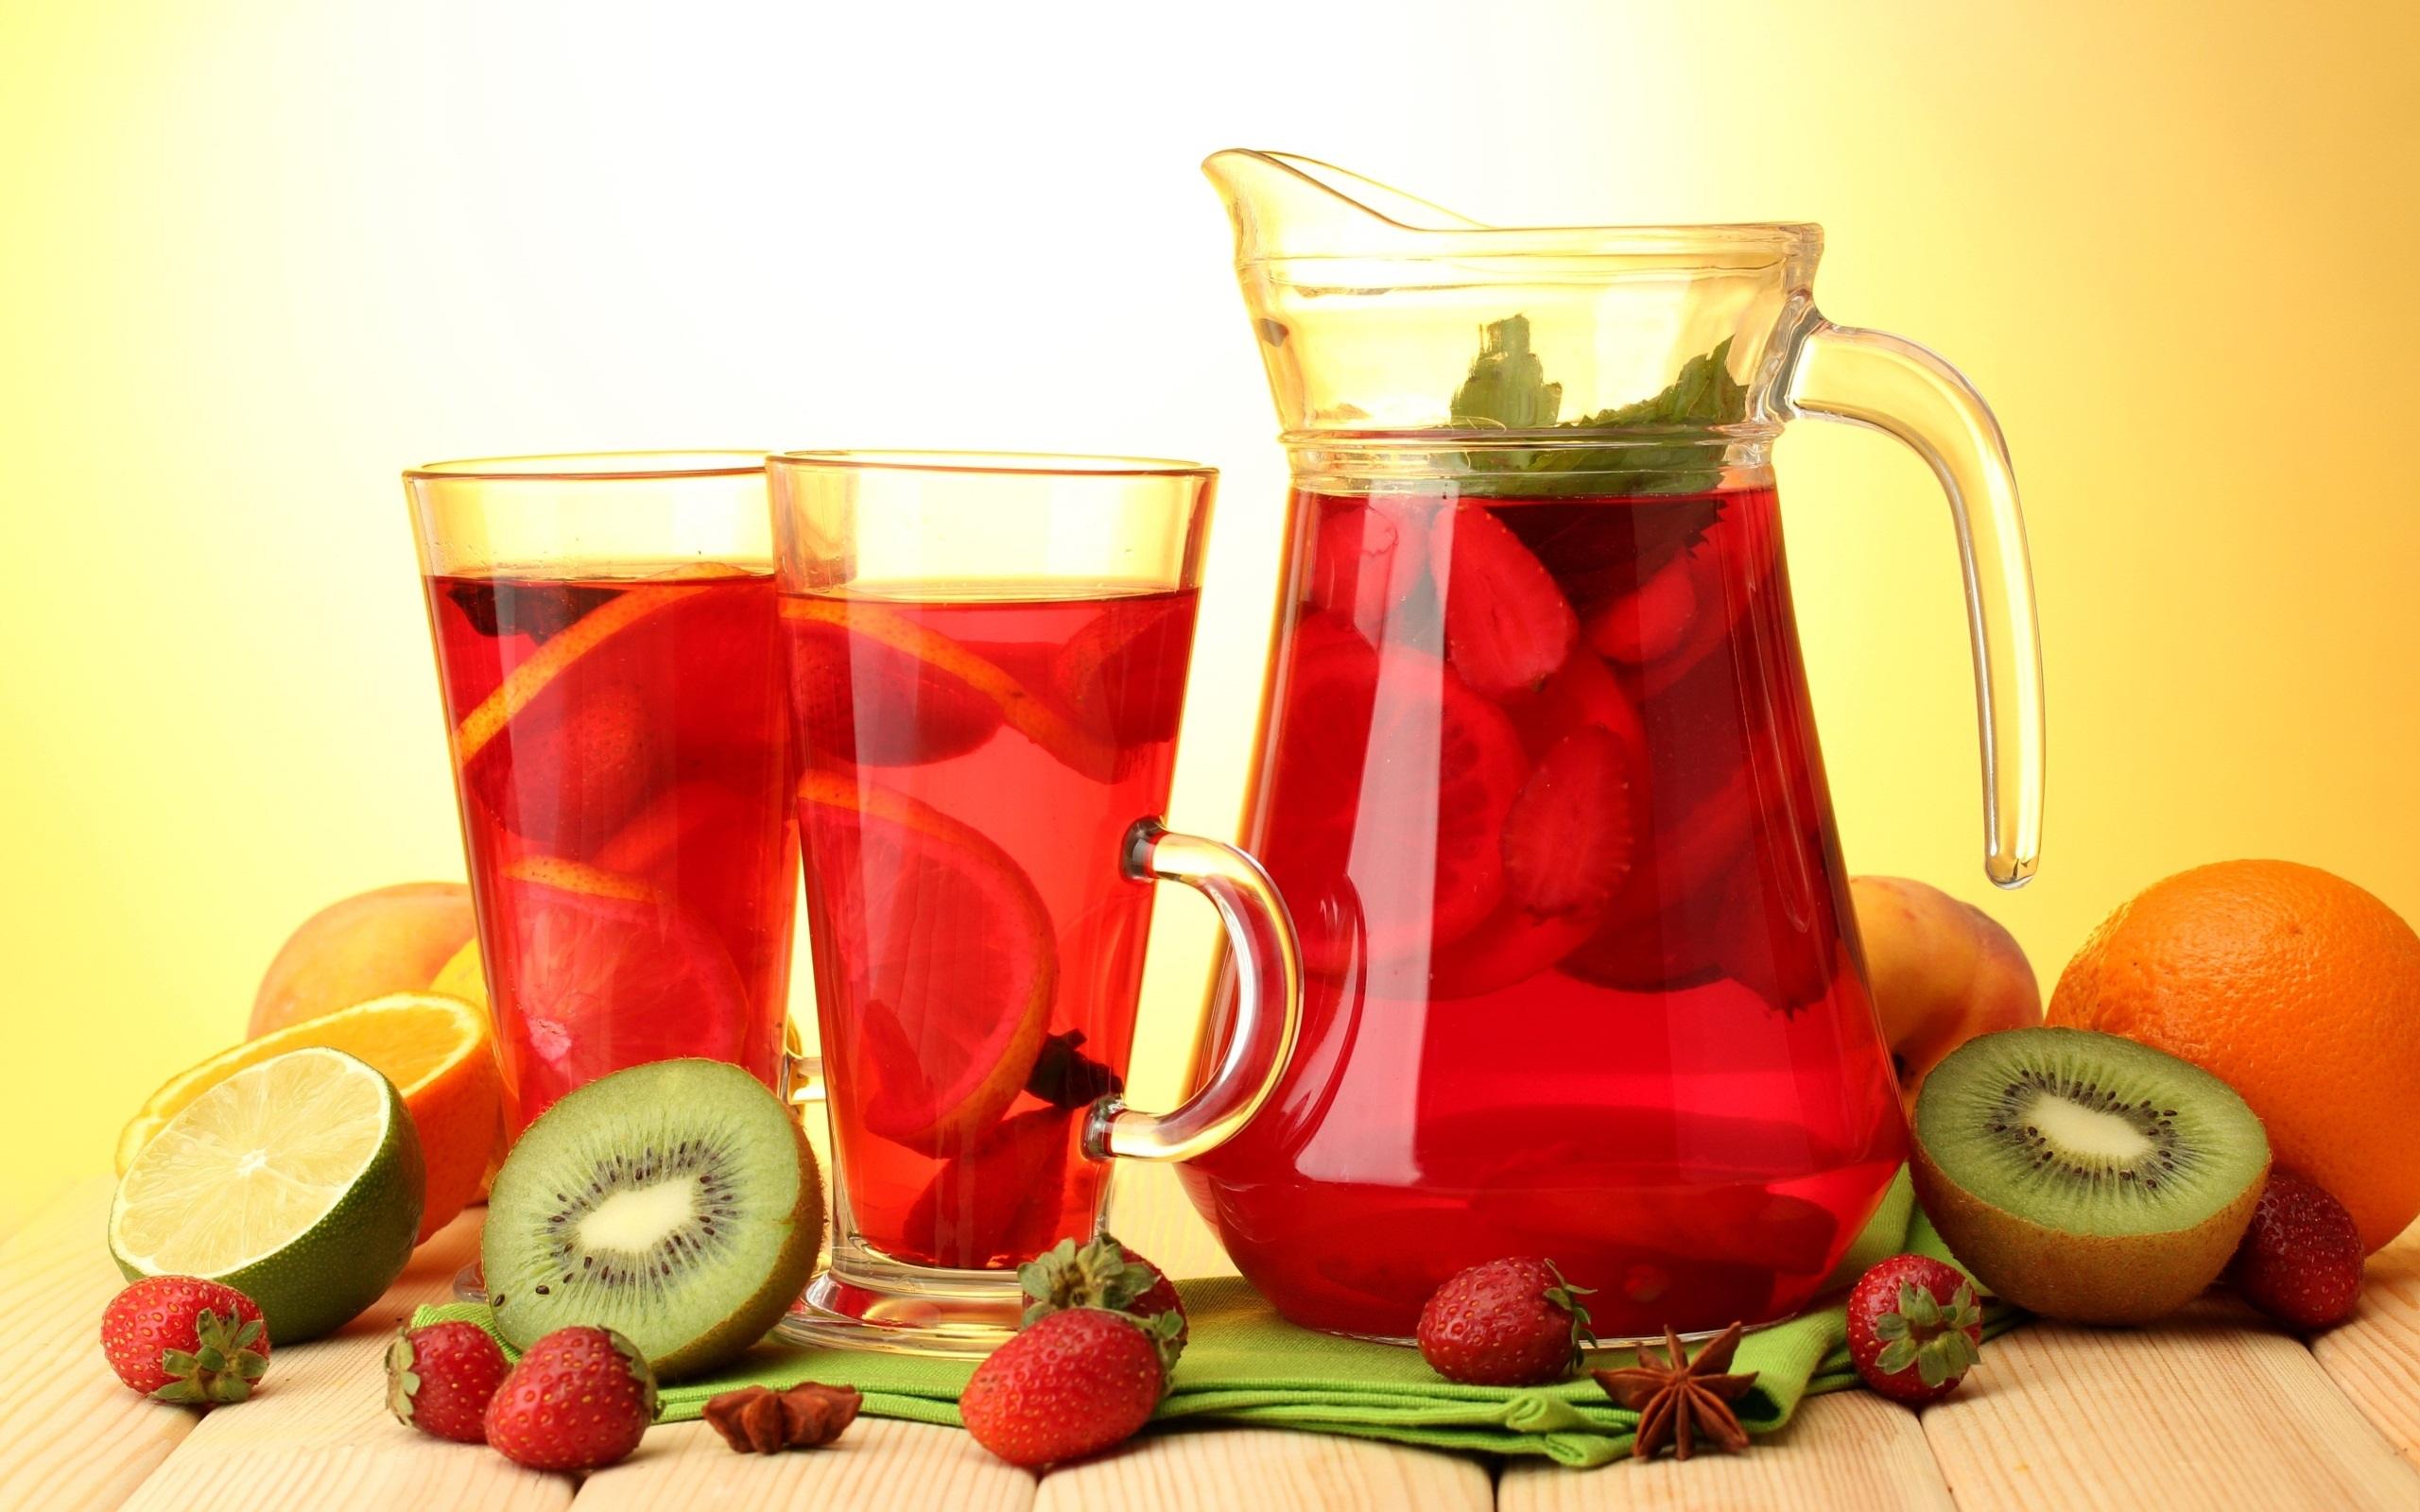 Juice Wallpaper 835715 Juice Wallpaper 835700 Juice Wallpaper 2560x1600